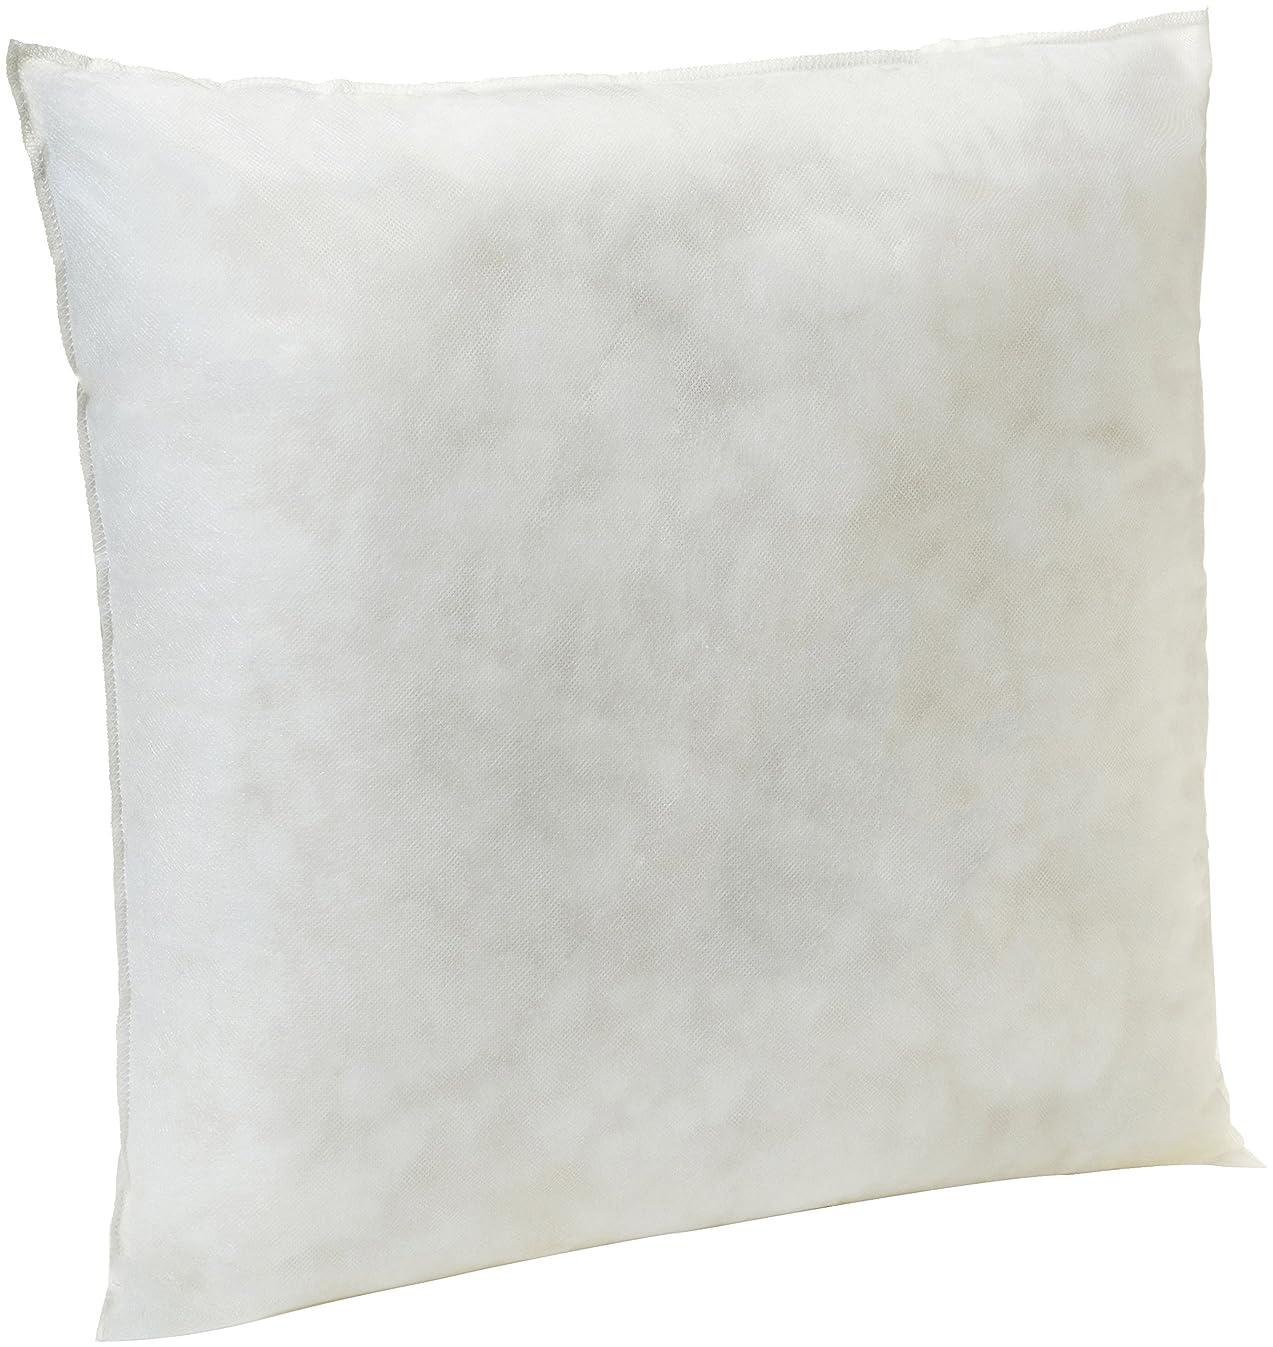 AmazonBasics Pillow Insert - 18-Inch Square, 2-Pack